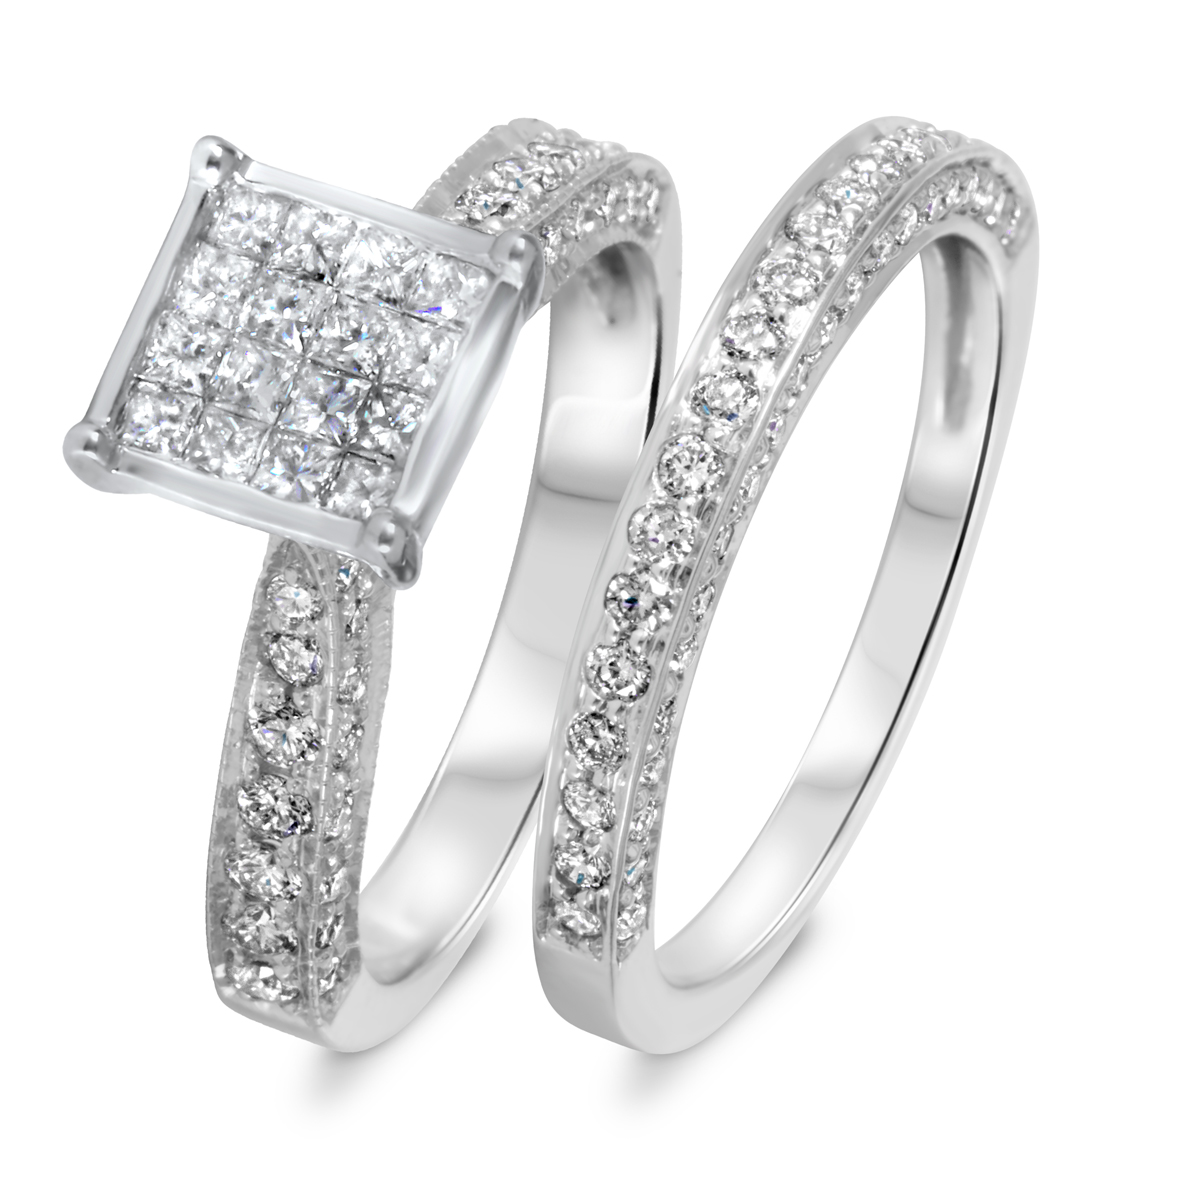 1 1/3 CT. T.W. Diamond Women's Bridal Wedding Ring Set 10K White Gold